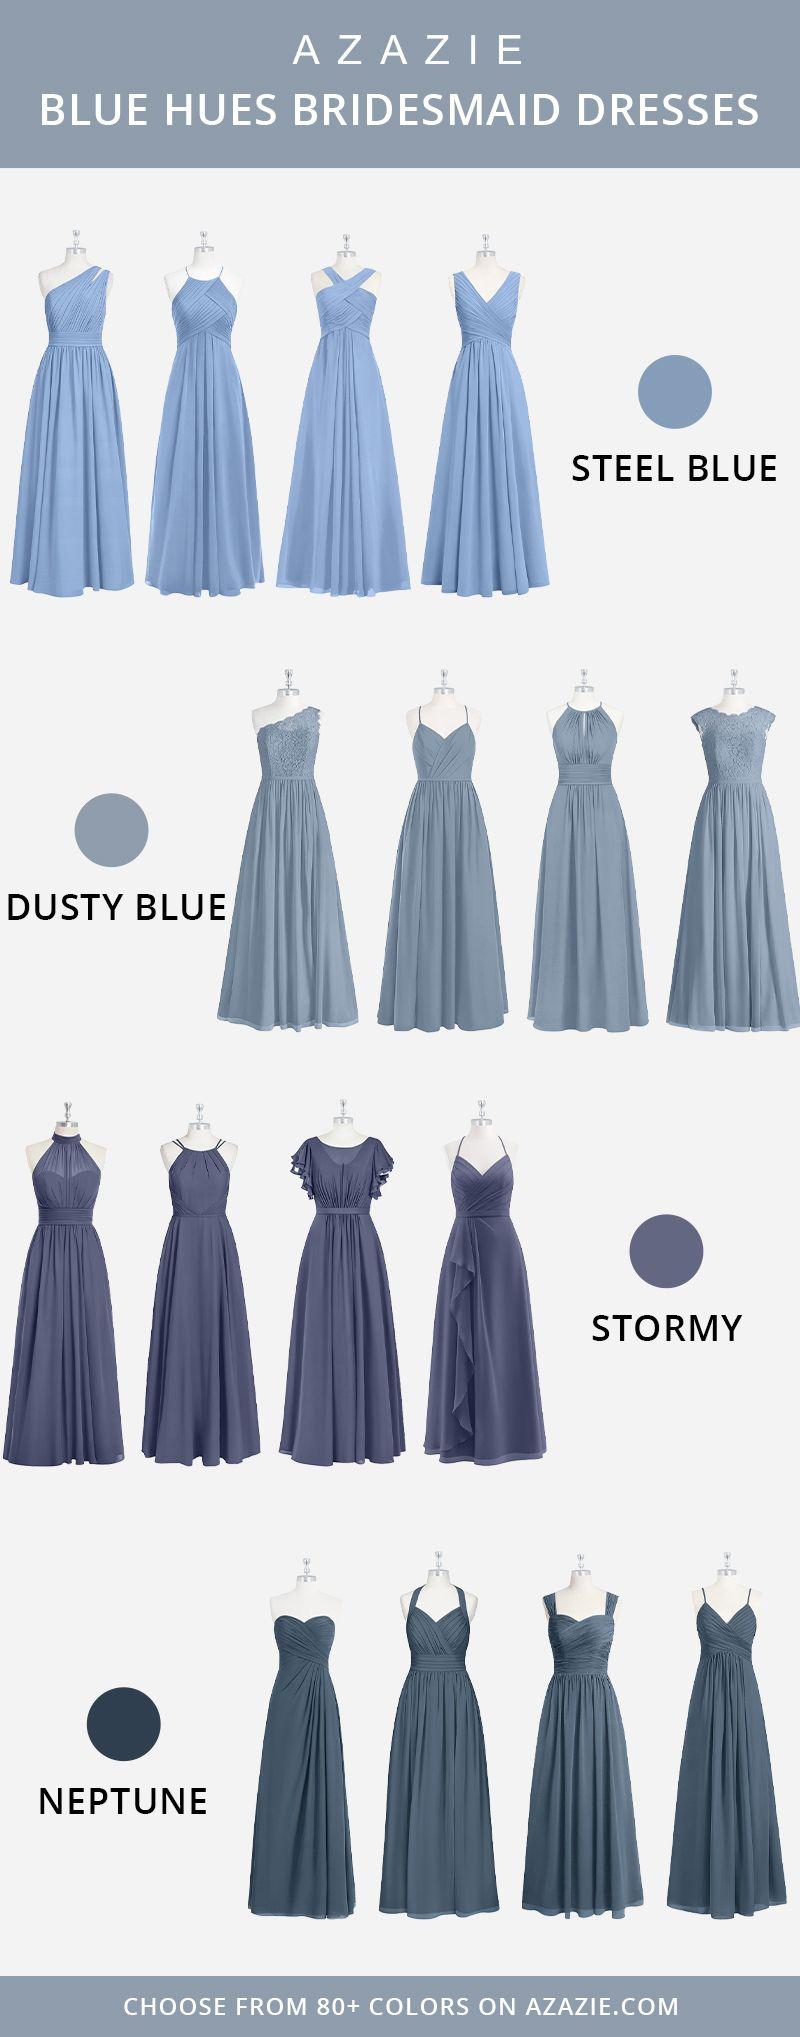 Blue Hues Bridesmaid Dresses Steel Blue Bridesmaid Dresses Dusty Blue Bridesmaid Dresses Bridesmaid Dresses [ 2037 x 800 Pixel ]